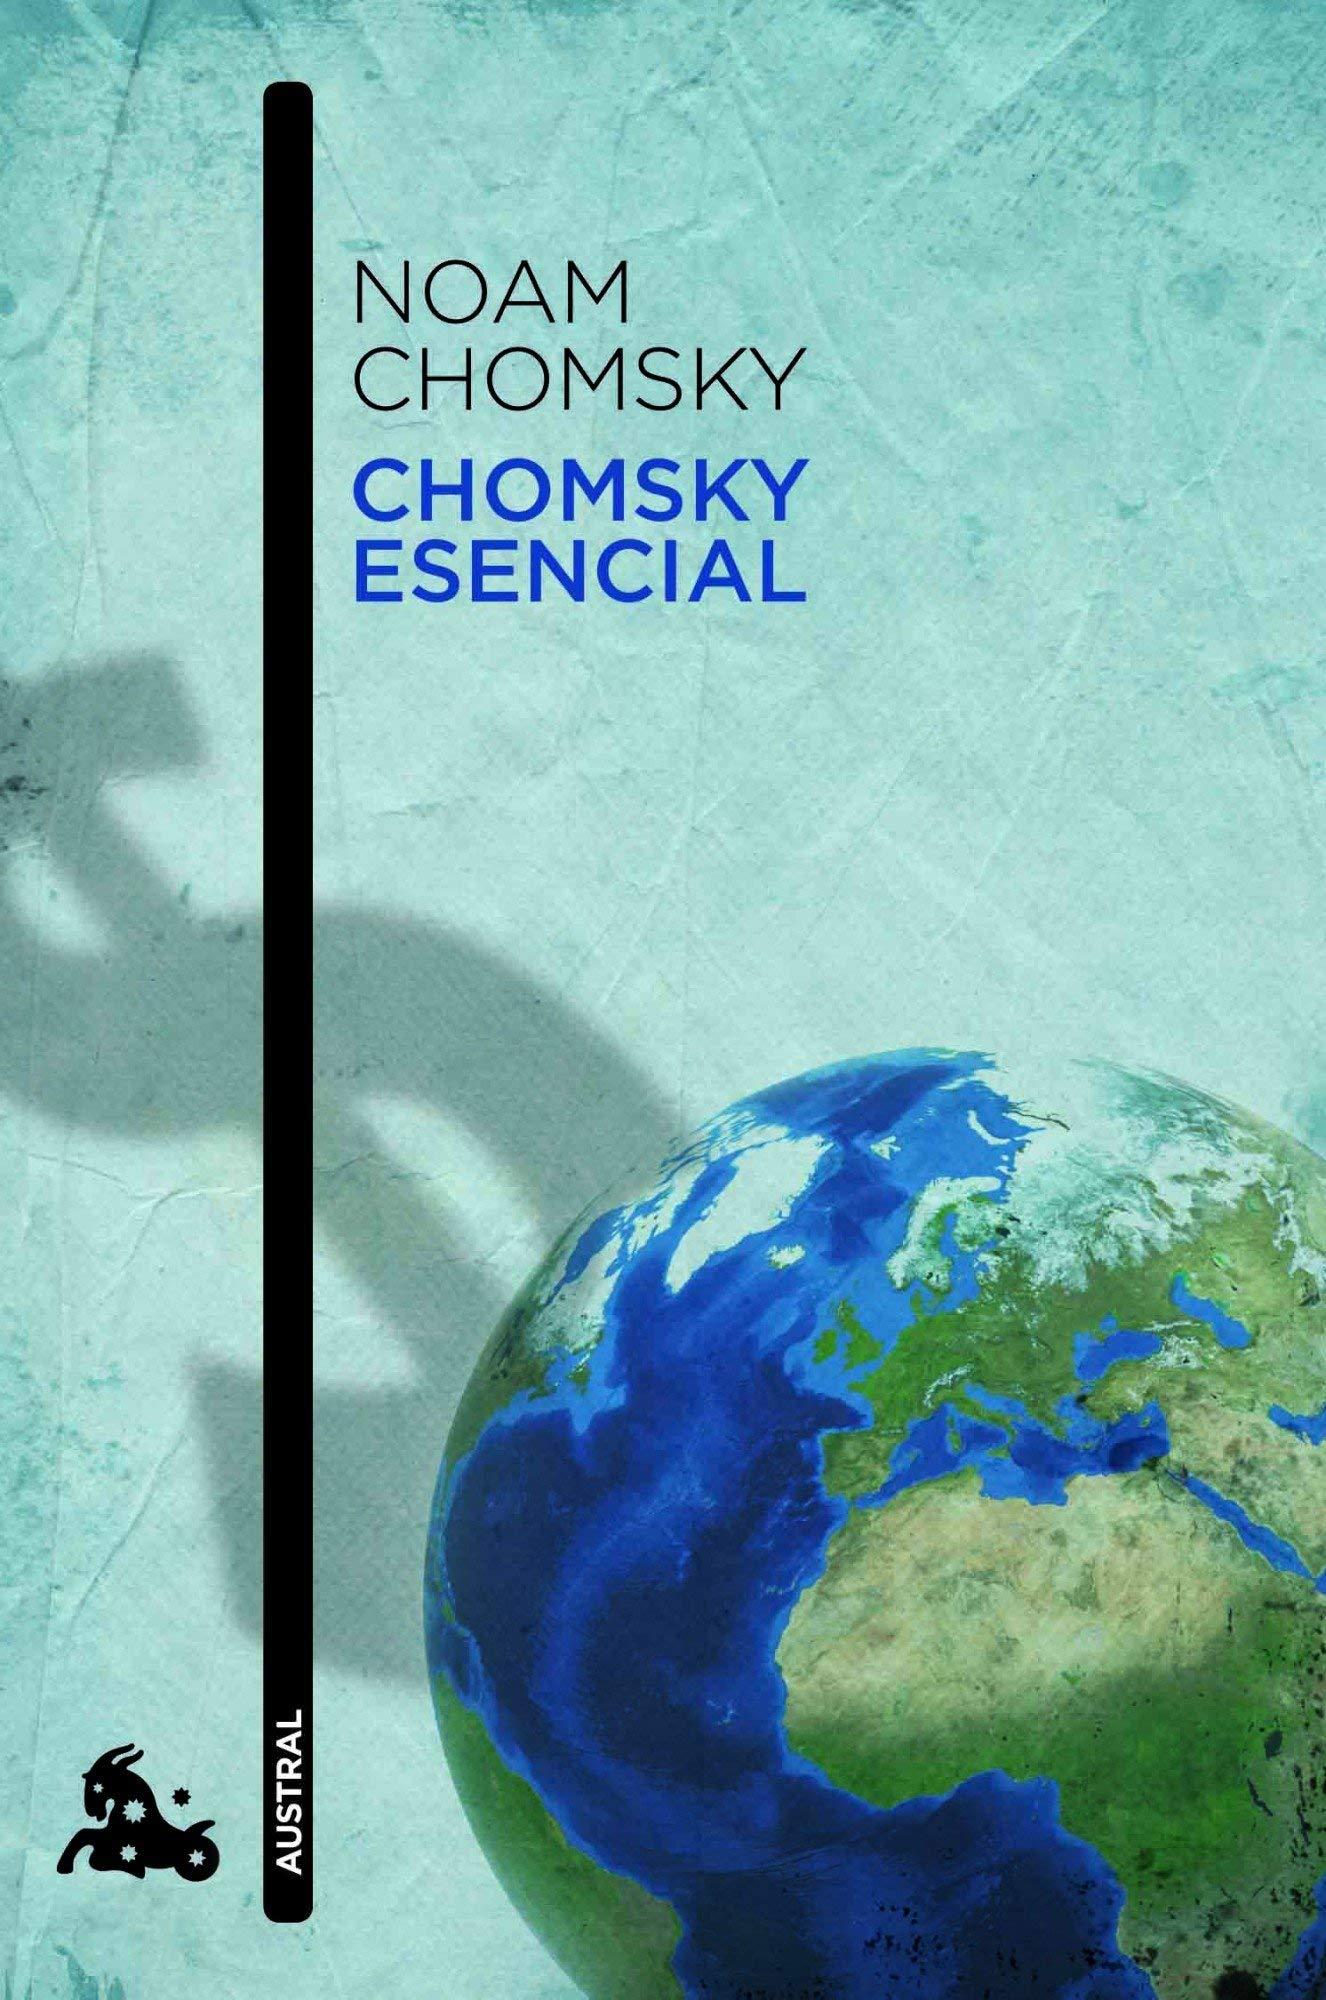 Chomsky esencial (Contemporánea): Amazon.es: Chomsky, Noam, Vigil, Jorge: Libros